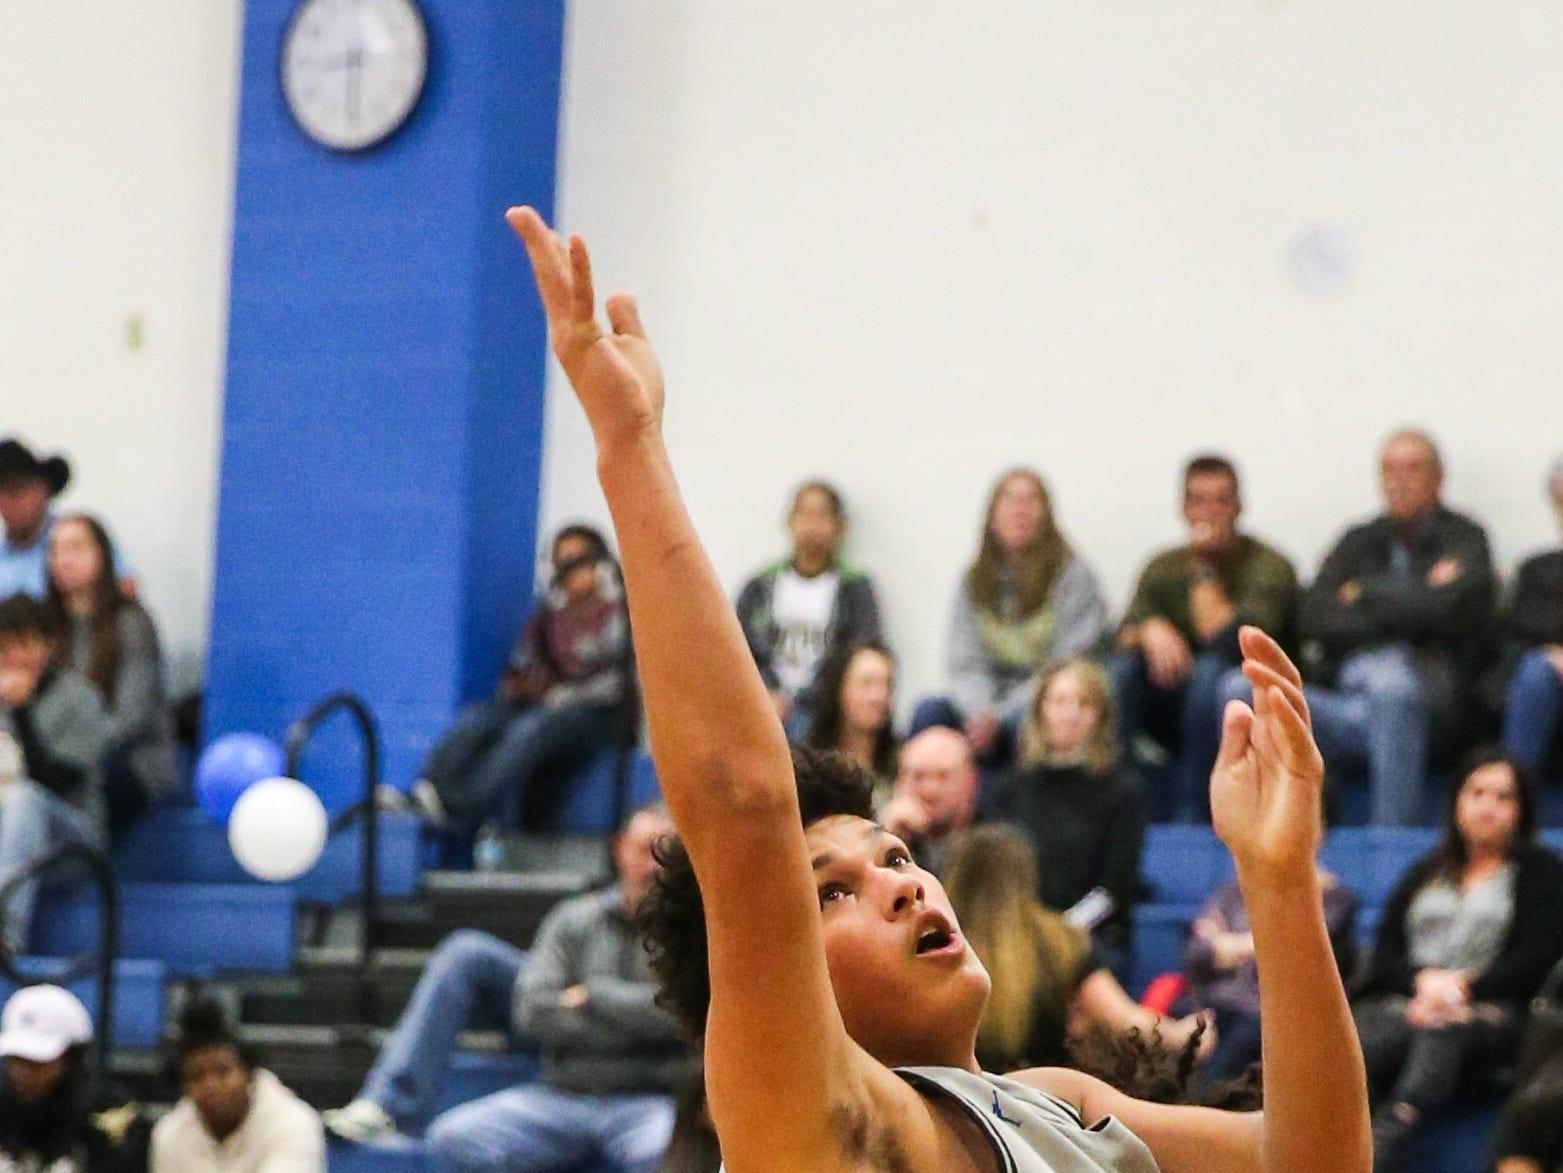 Lake View's Joseph Brooks jumps to shoot against Big Spring Friday, Jan. 25, 2019, at Lake View gym.